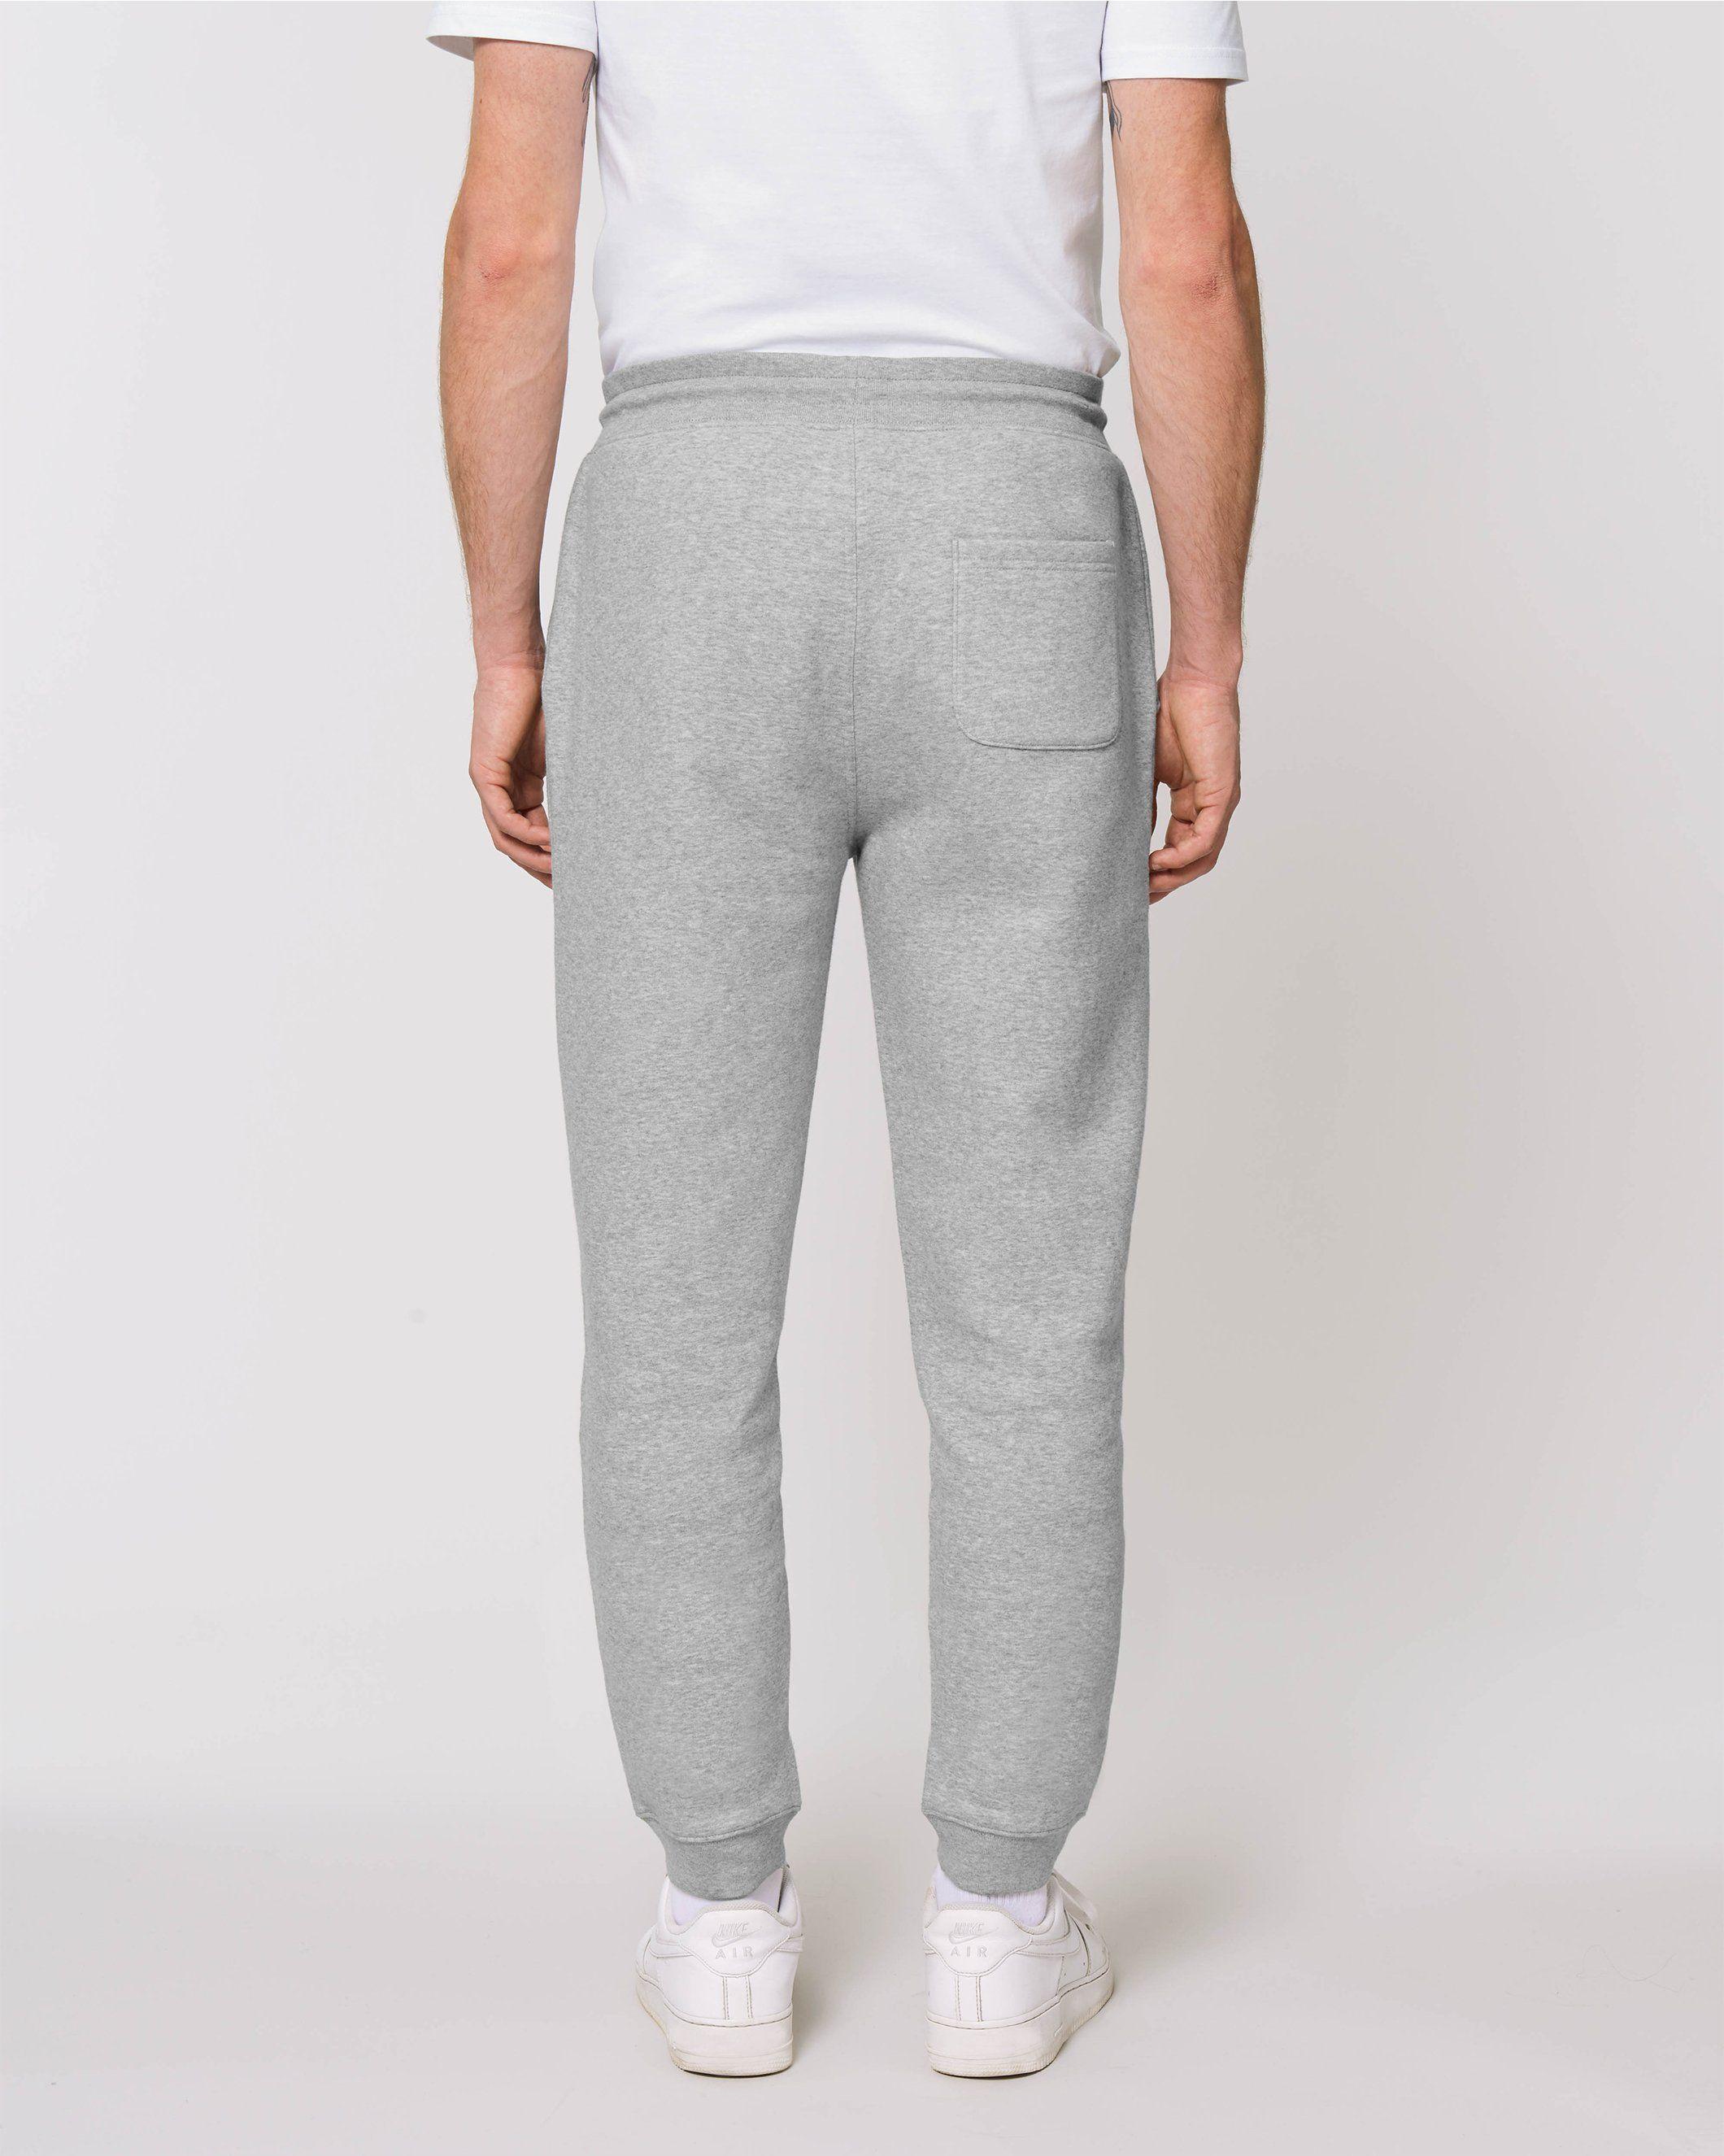 Oneness Unisex Jogger Pants in Grey